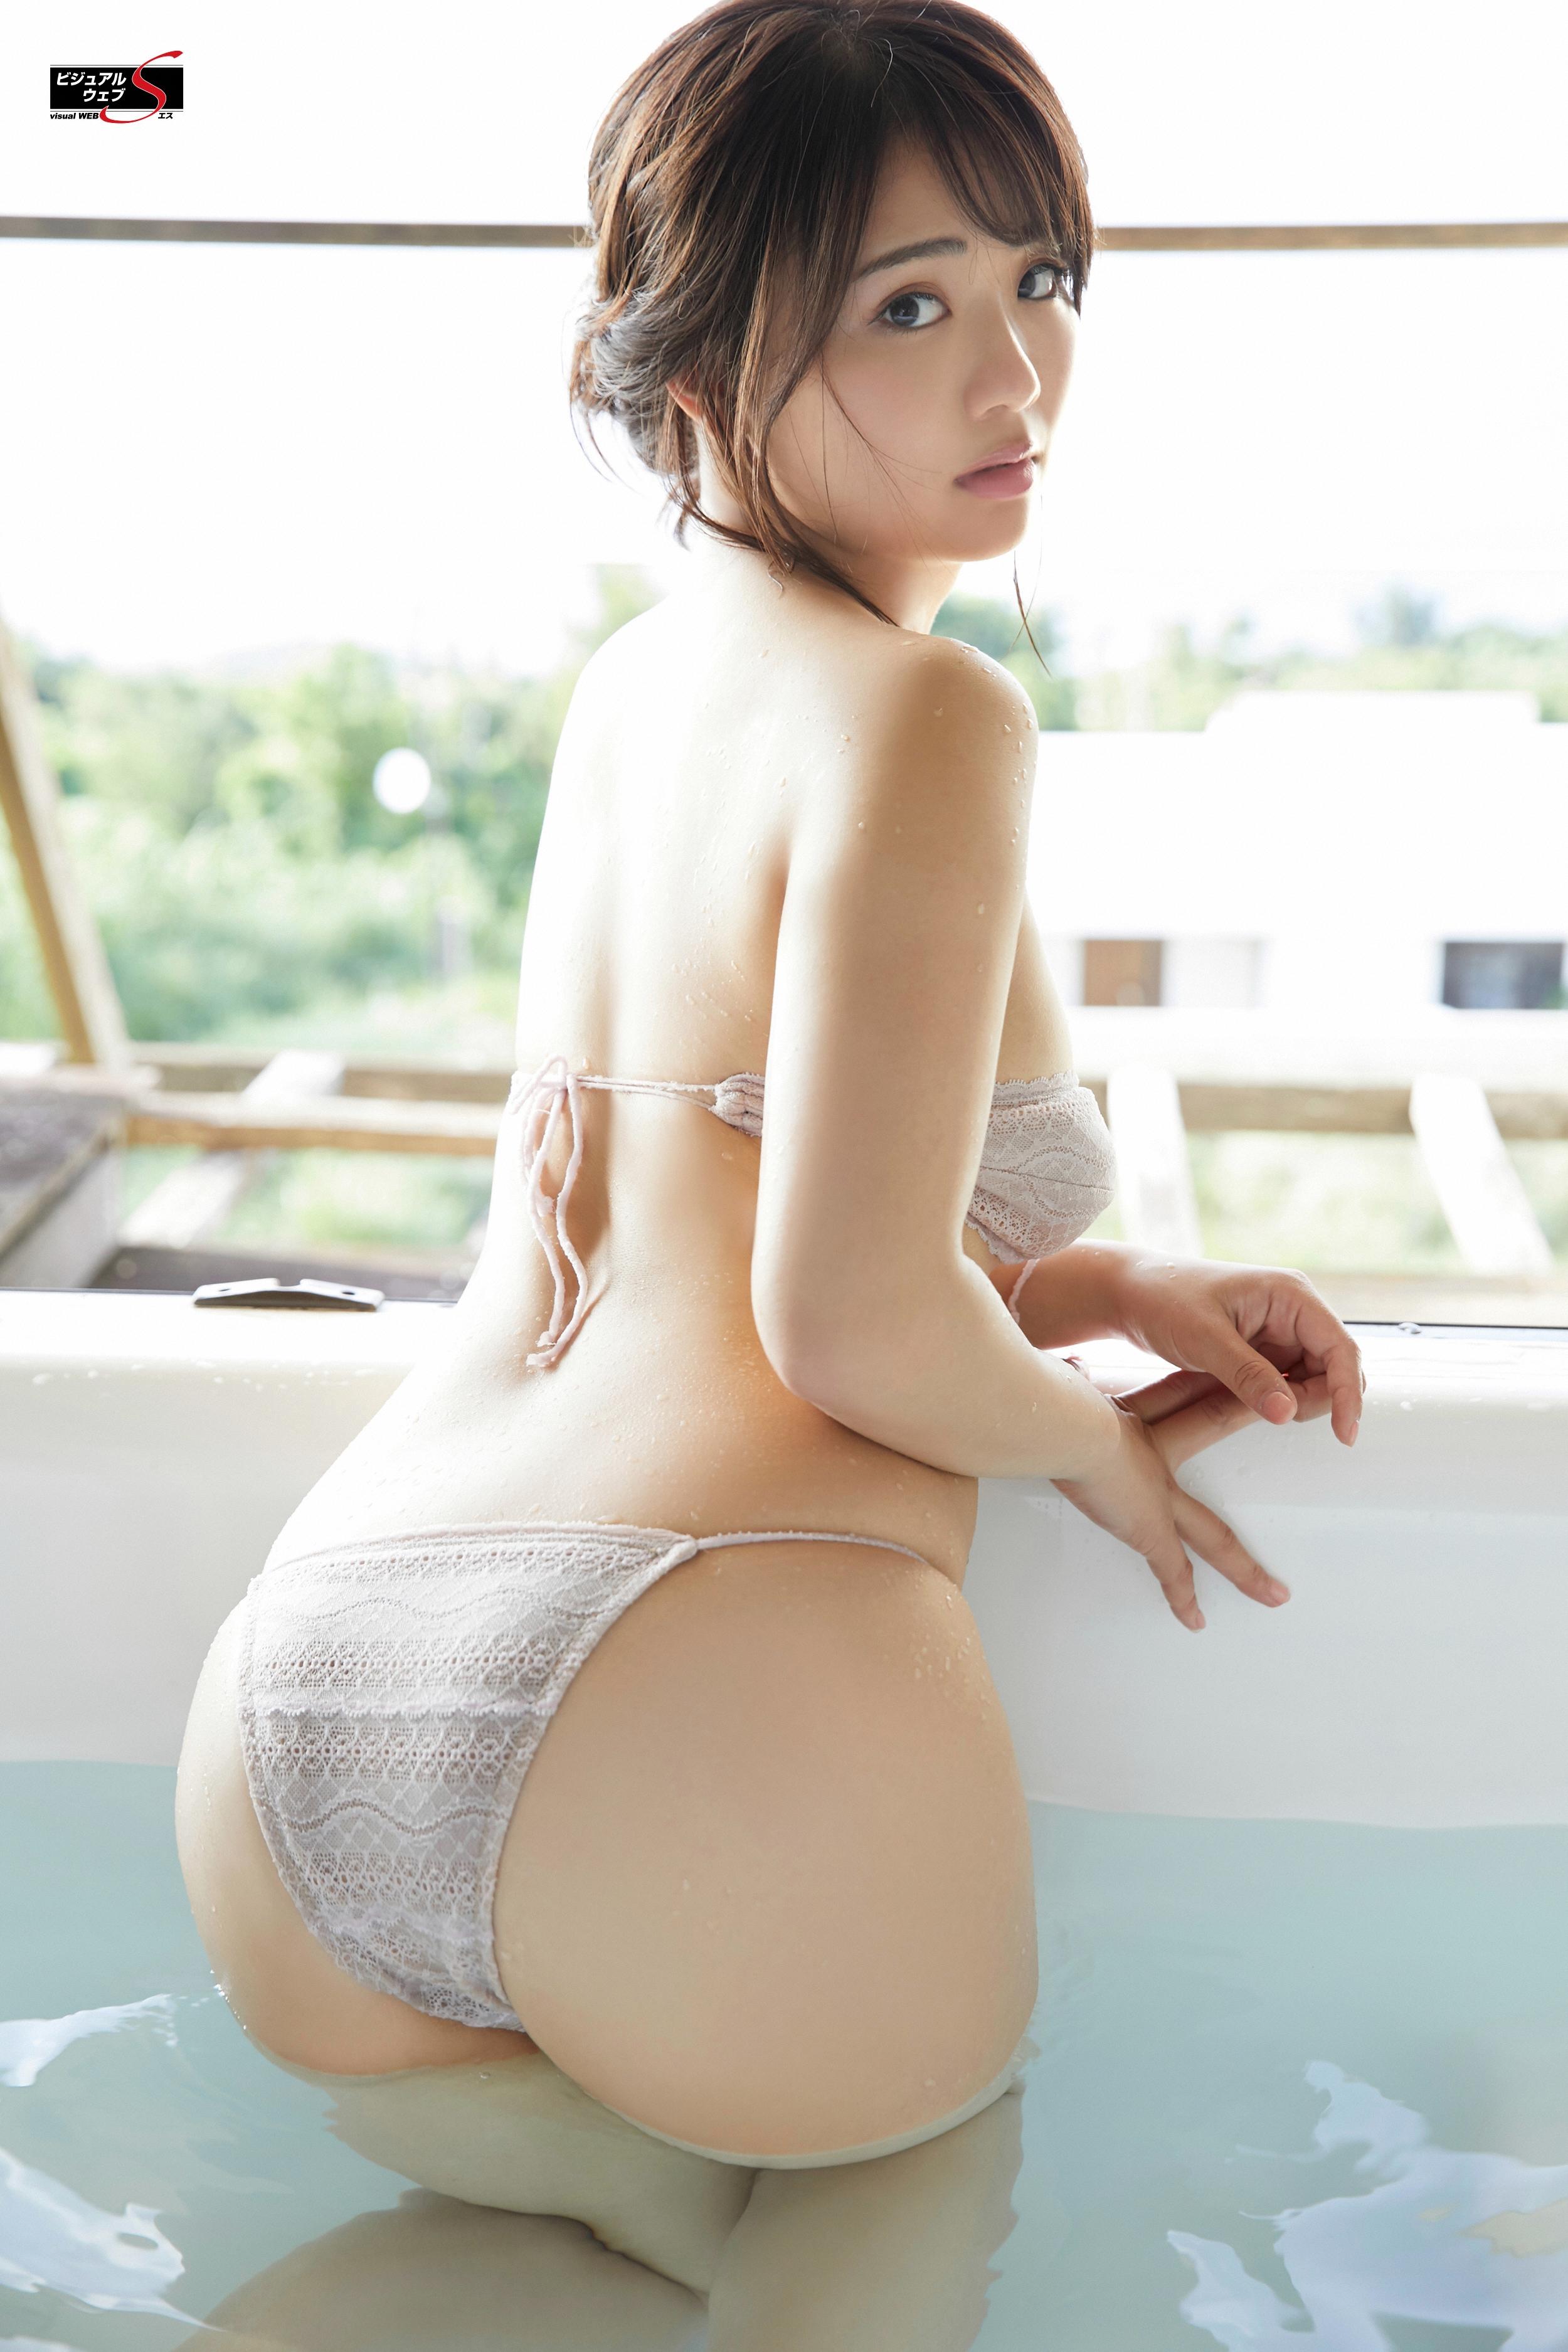 People 2500x3750 Japanese women Japanese women Asian gravure Natsumi Hirajima YS-Web big boobs natural boobs women indoors ass